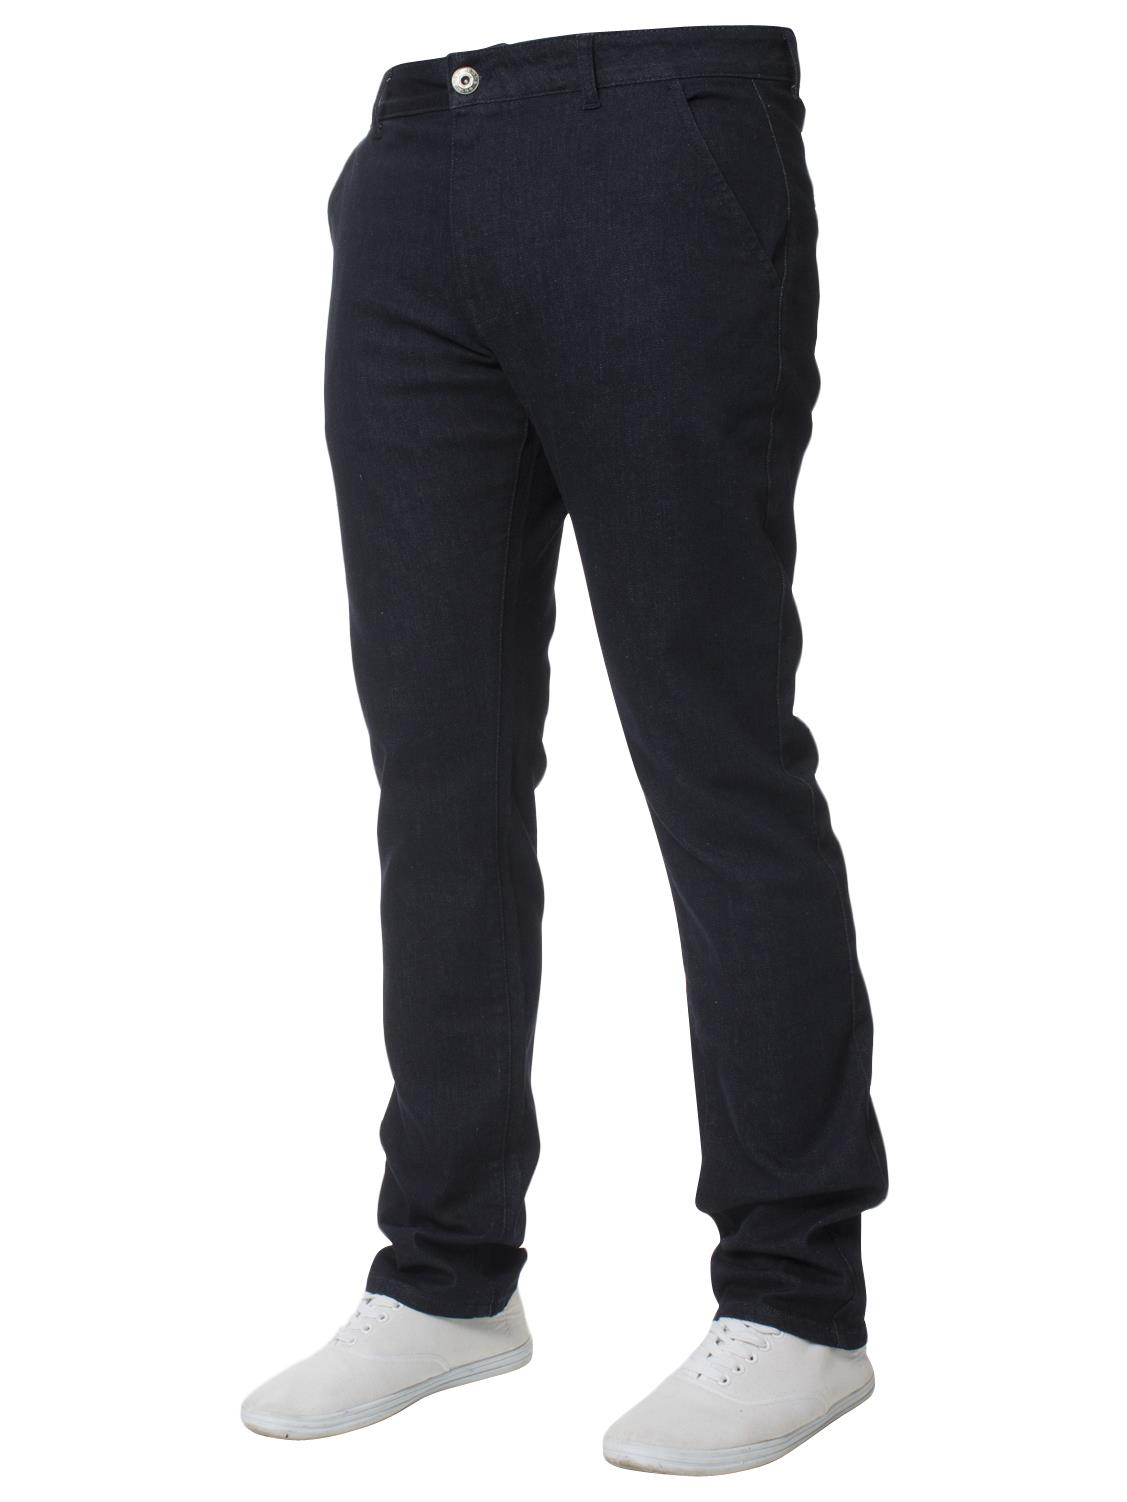 Enzo-Mens-Big-Tall-Jeans-Leg-King-Size-Denim-Pants-Chino-Trousers-Pants-44-034-60-034 thumbnail 30